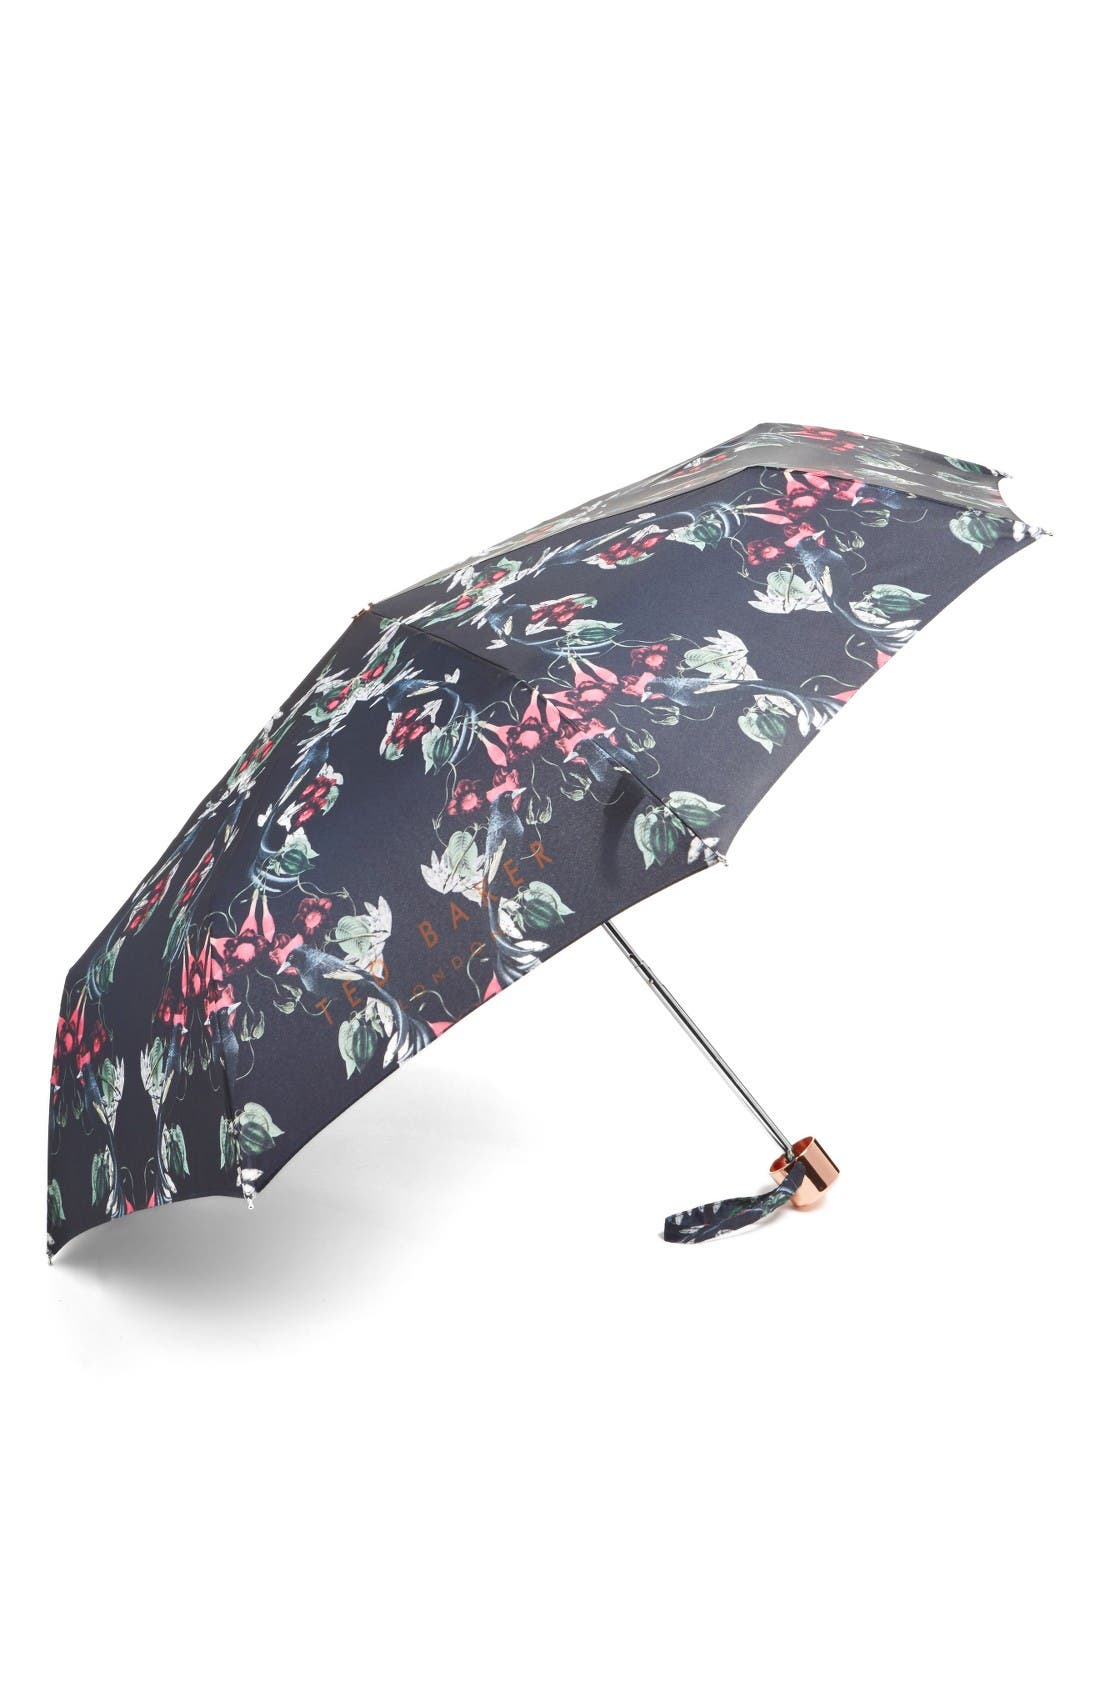 Ted Baker London 'Blue Beauty' Umbrella